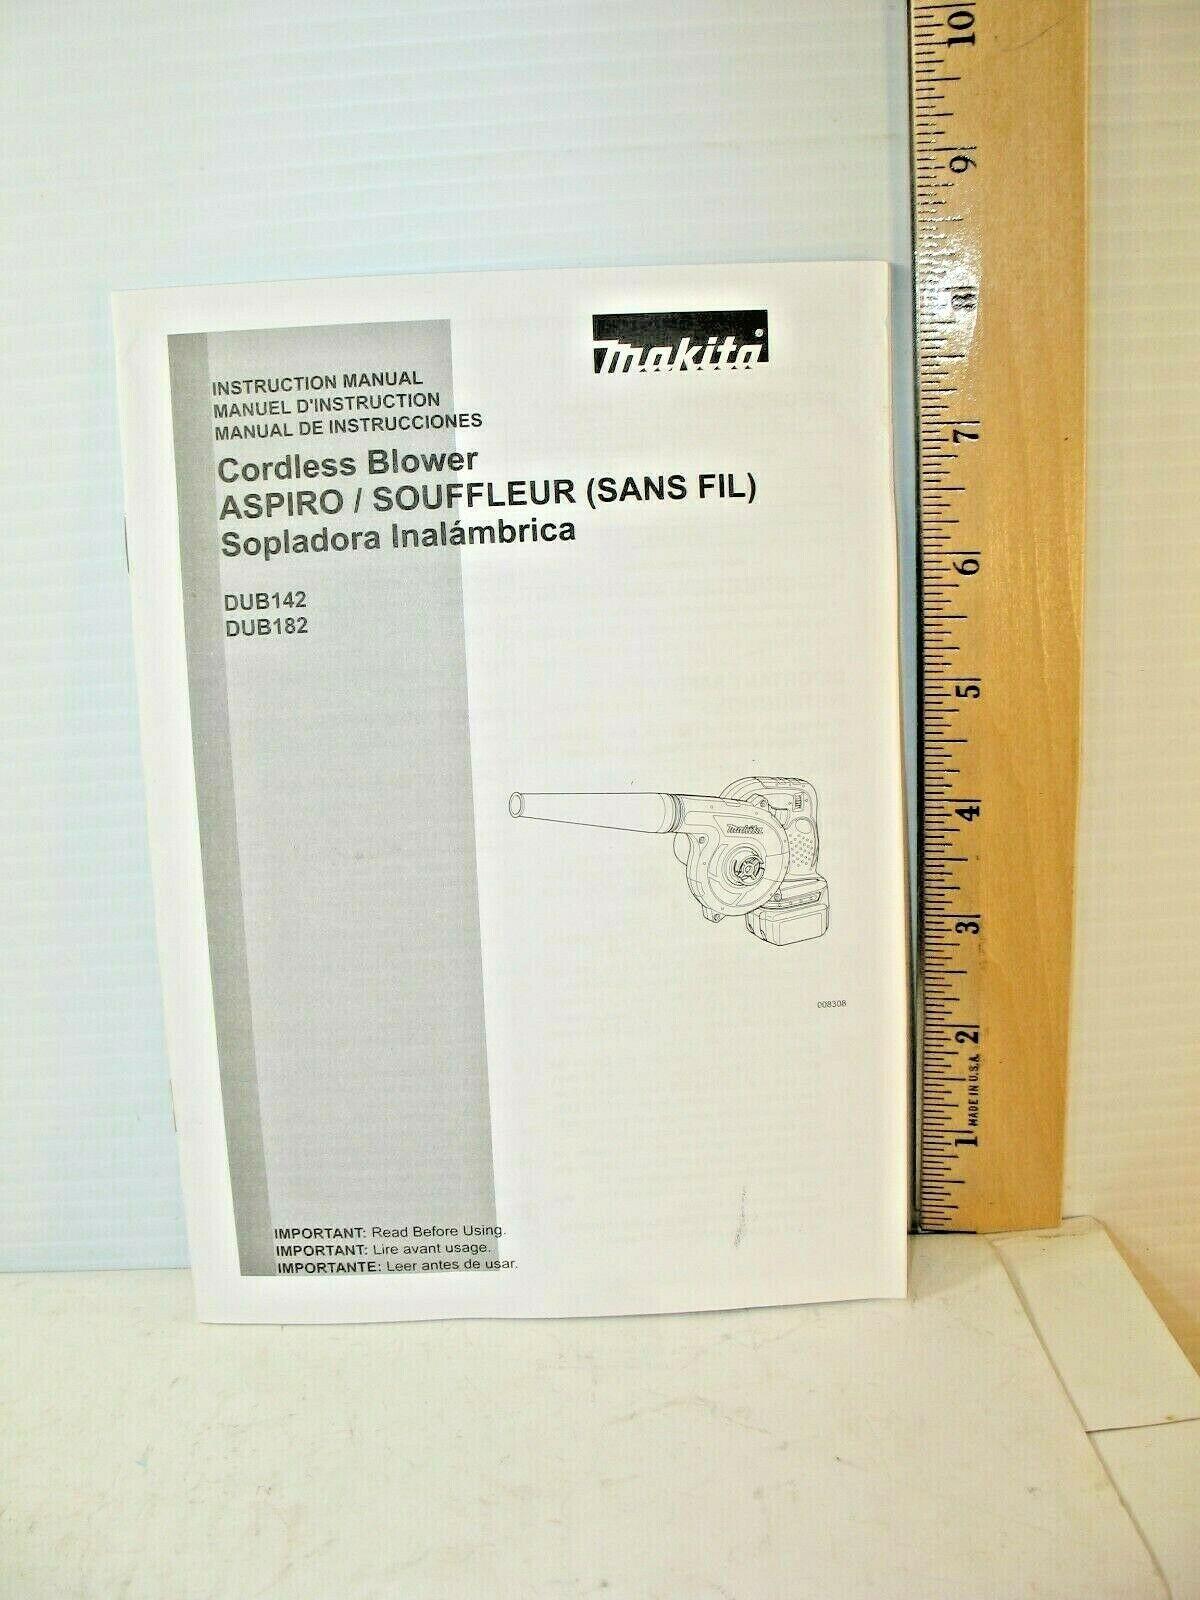 Makita Cordless Blower Instruction Manual DUB142/DUB182